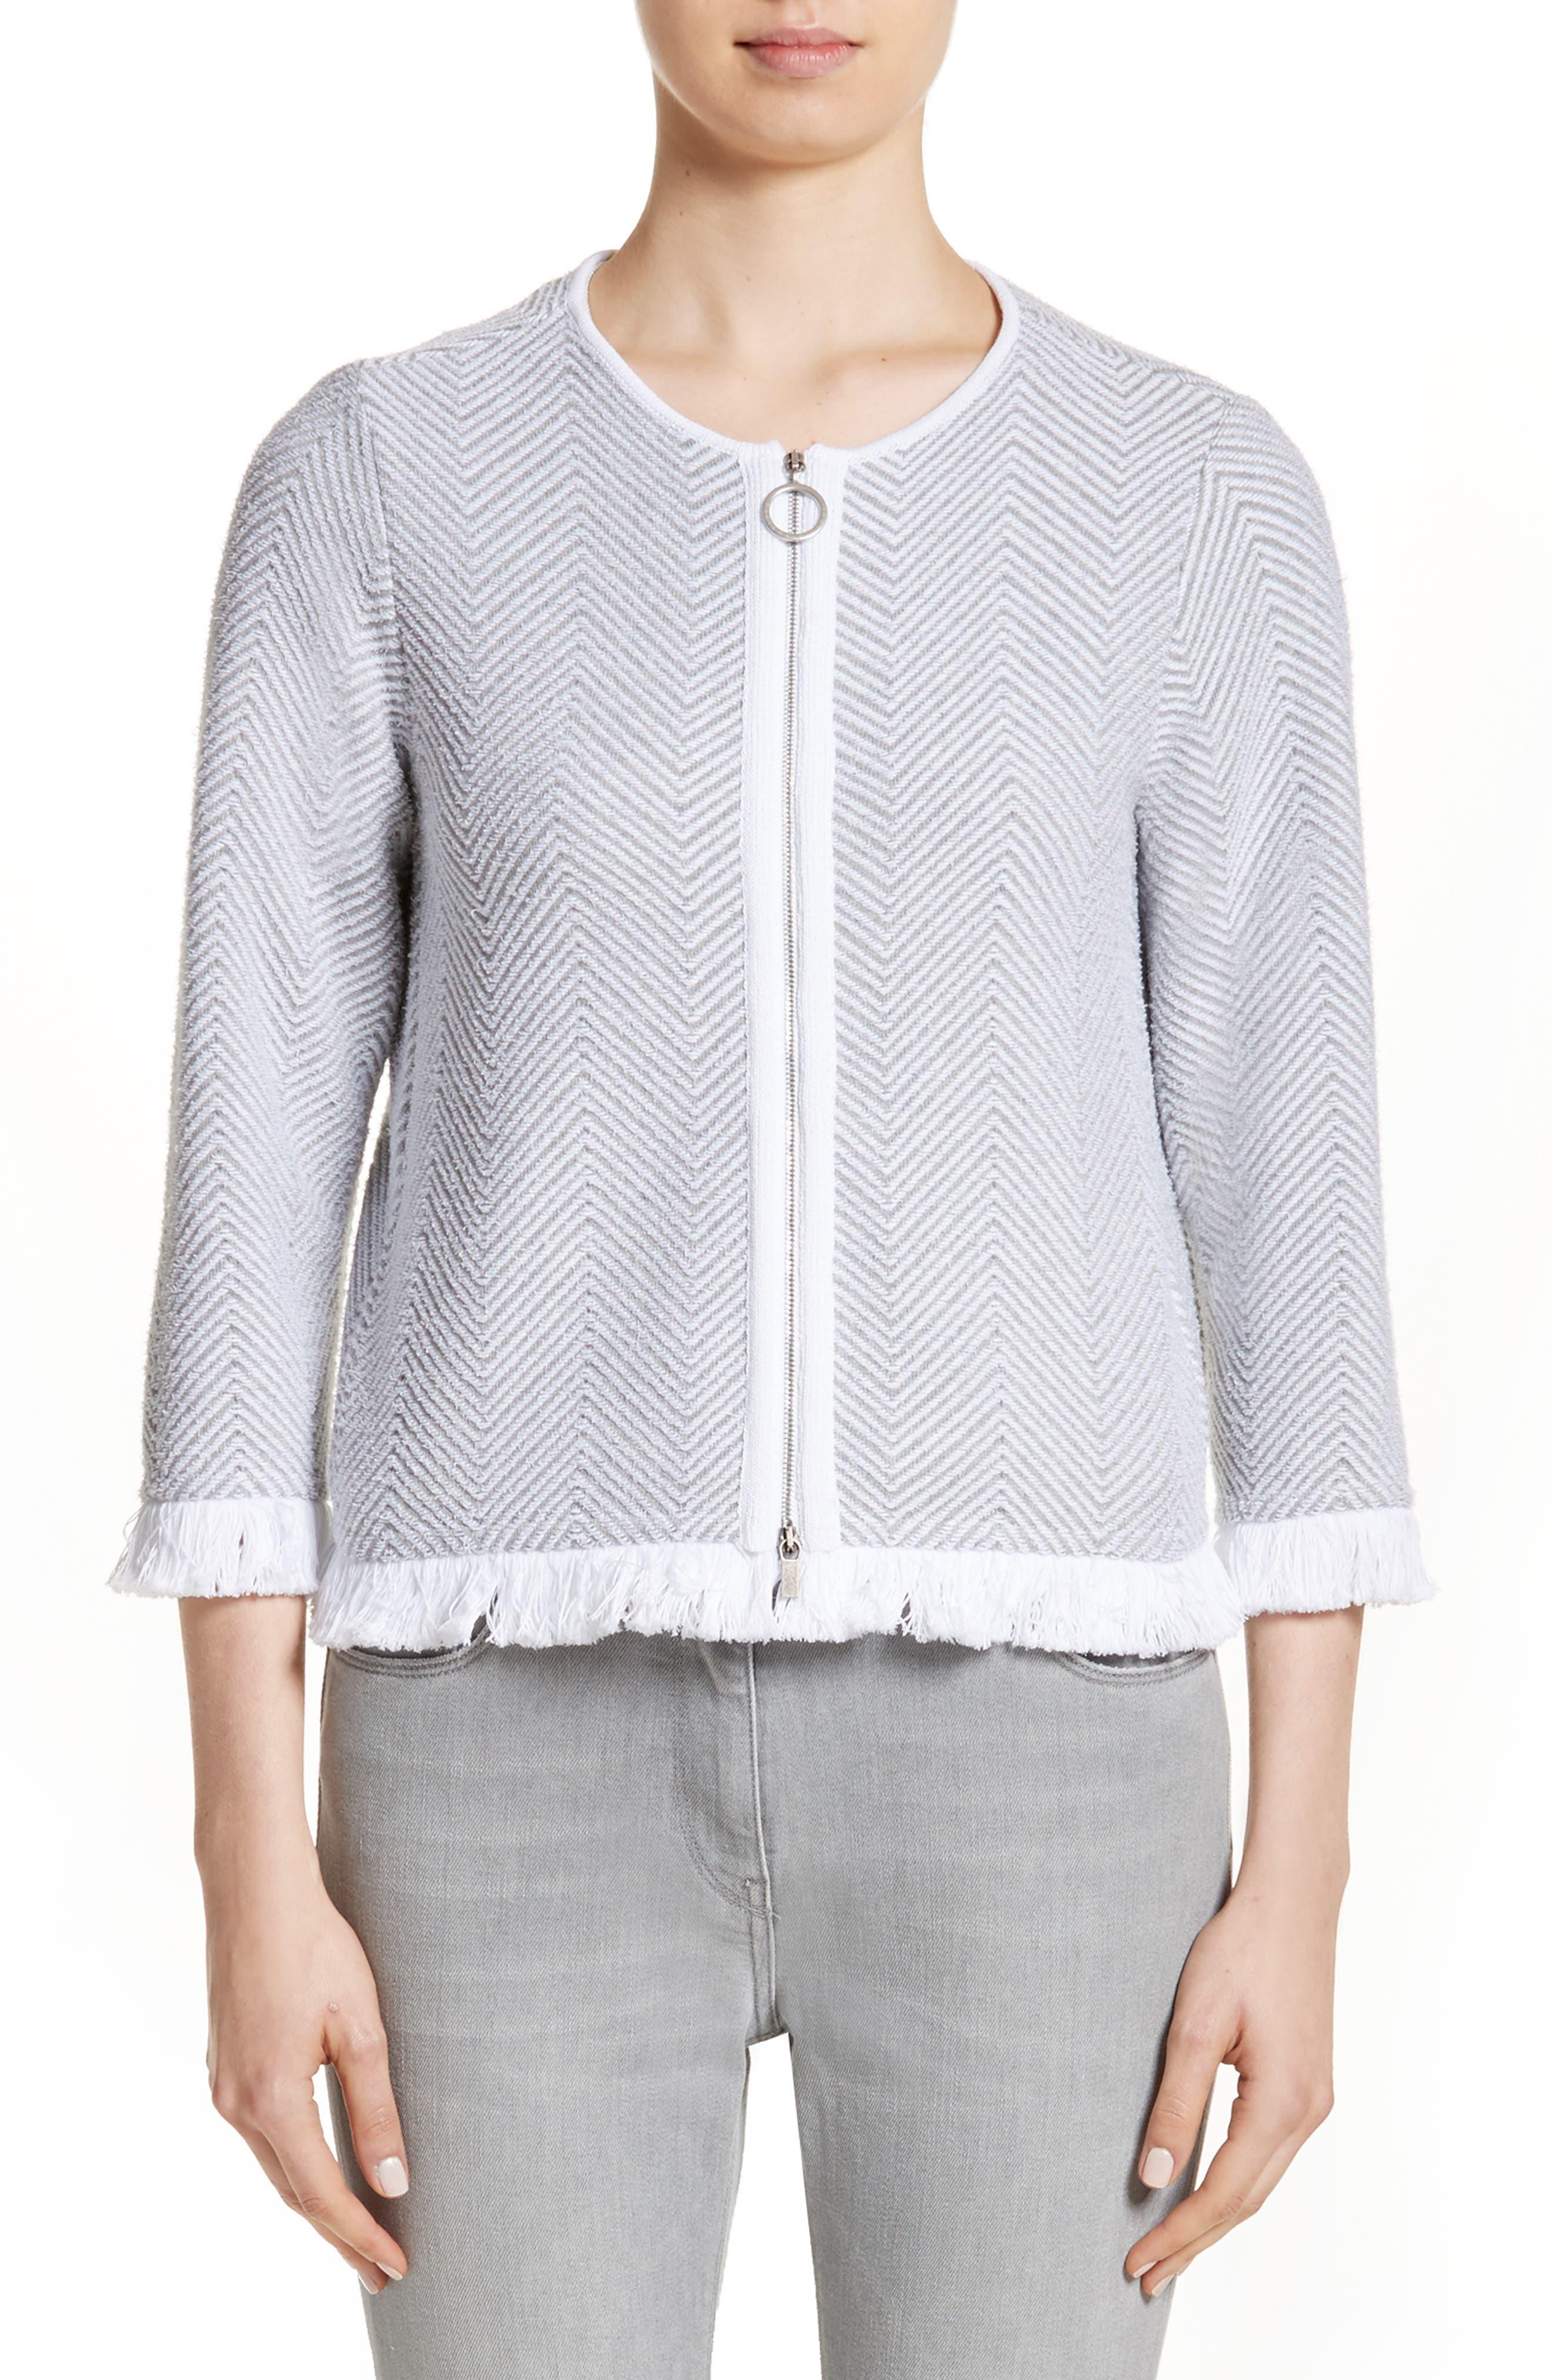 Alternate Image 1 Selected - Fabiana Filippi Chevron Knit Jacket